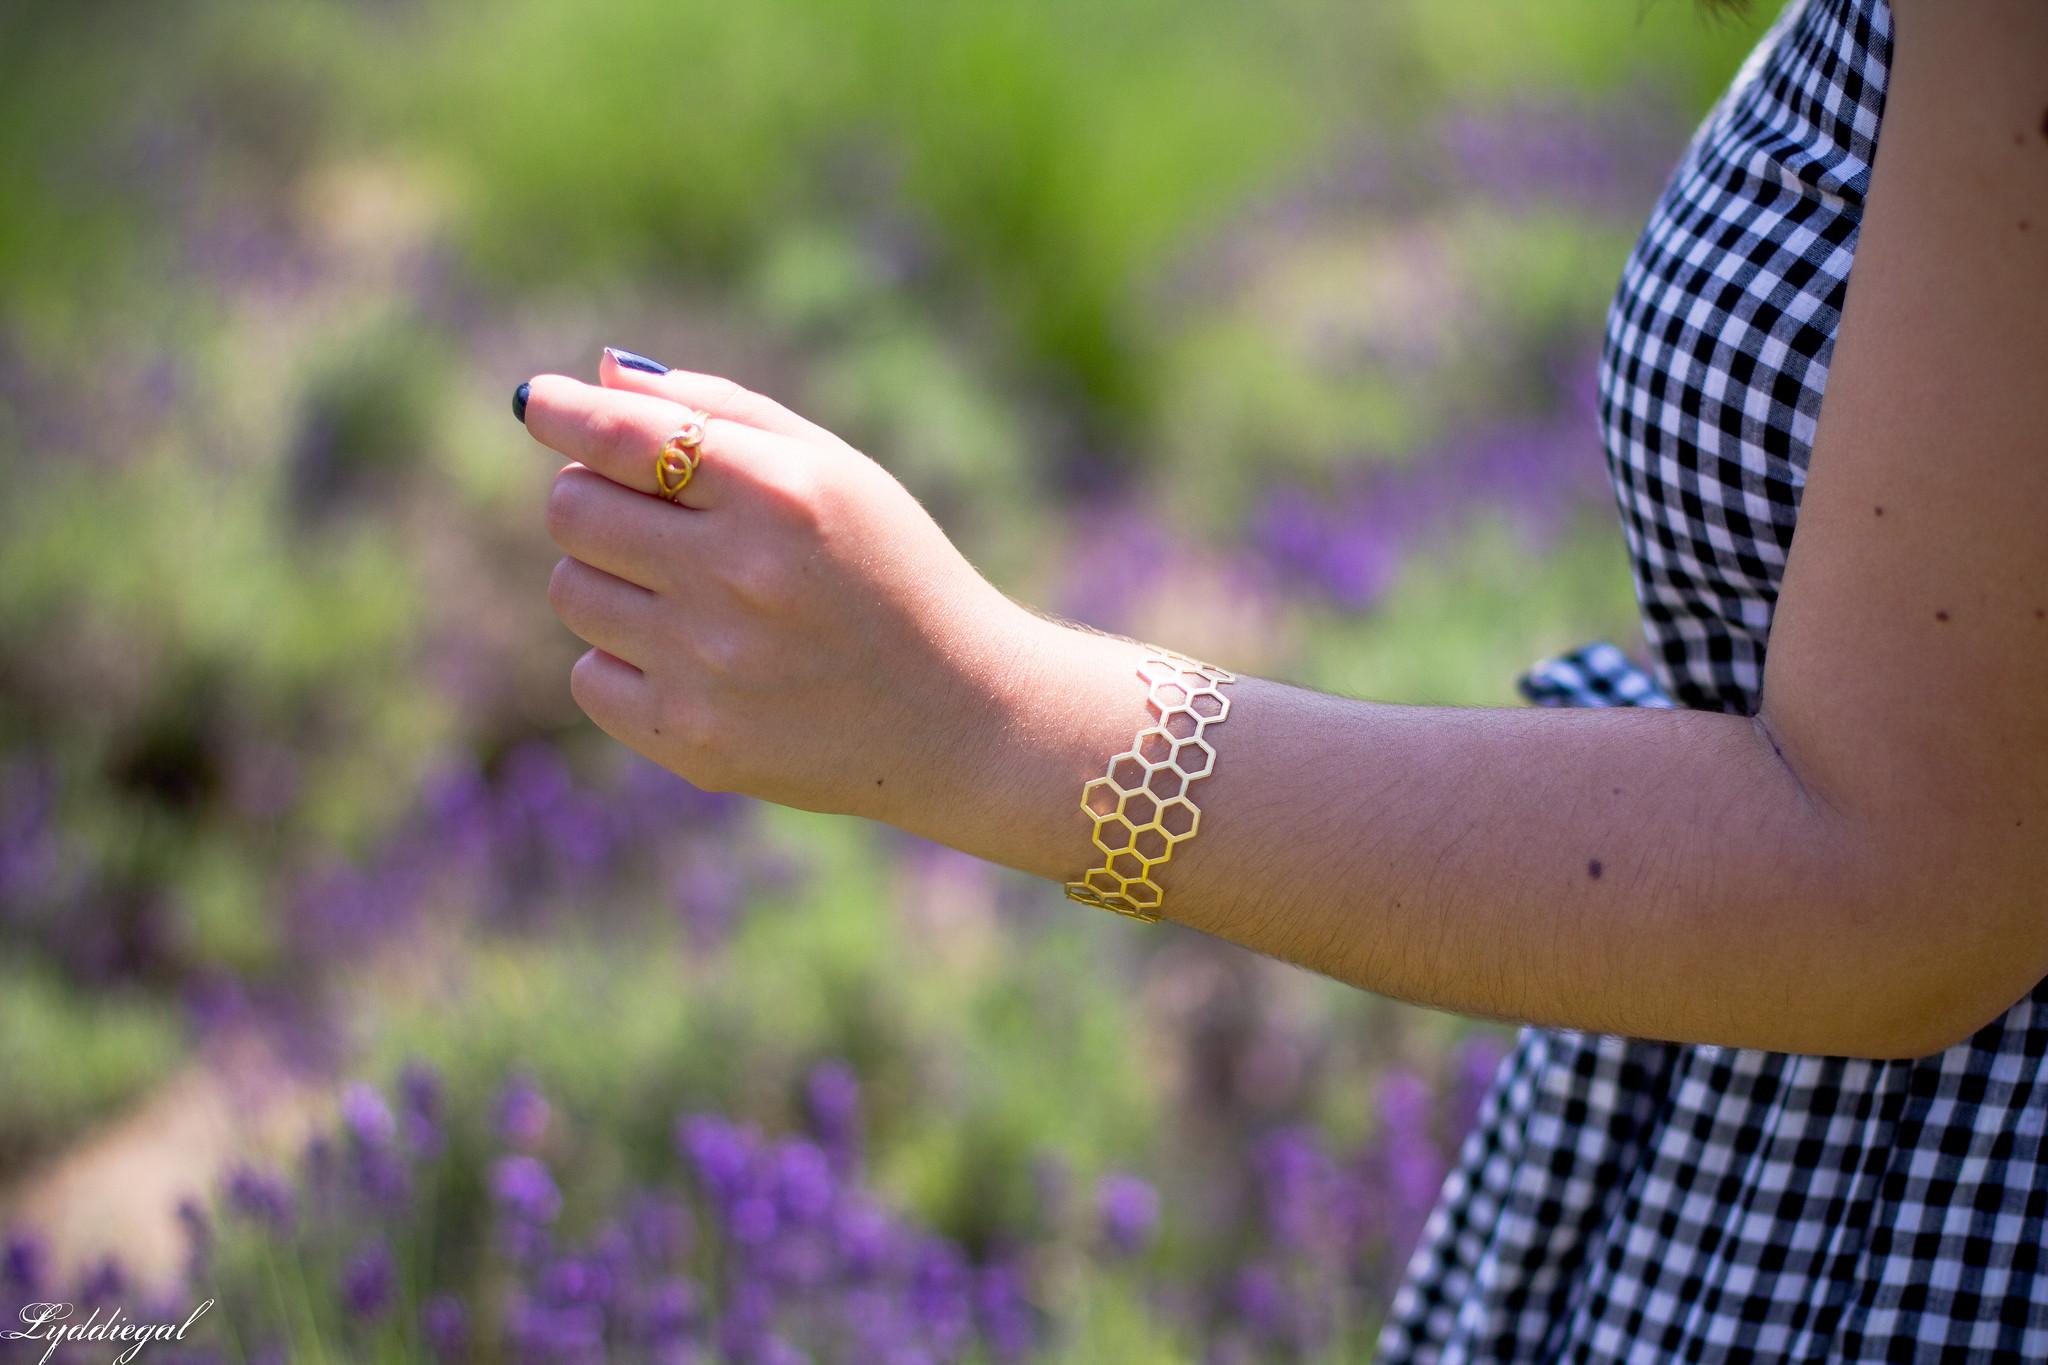 gingham maxi dress, pinata tote bag, lavender field-16.jpg